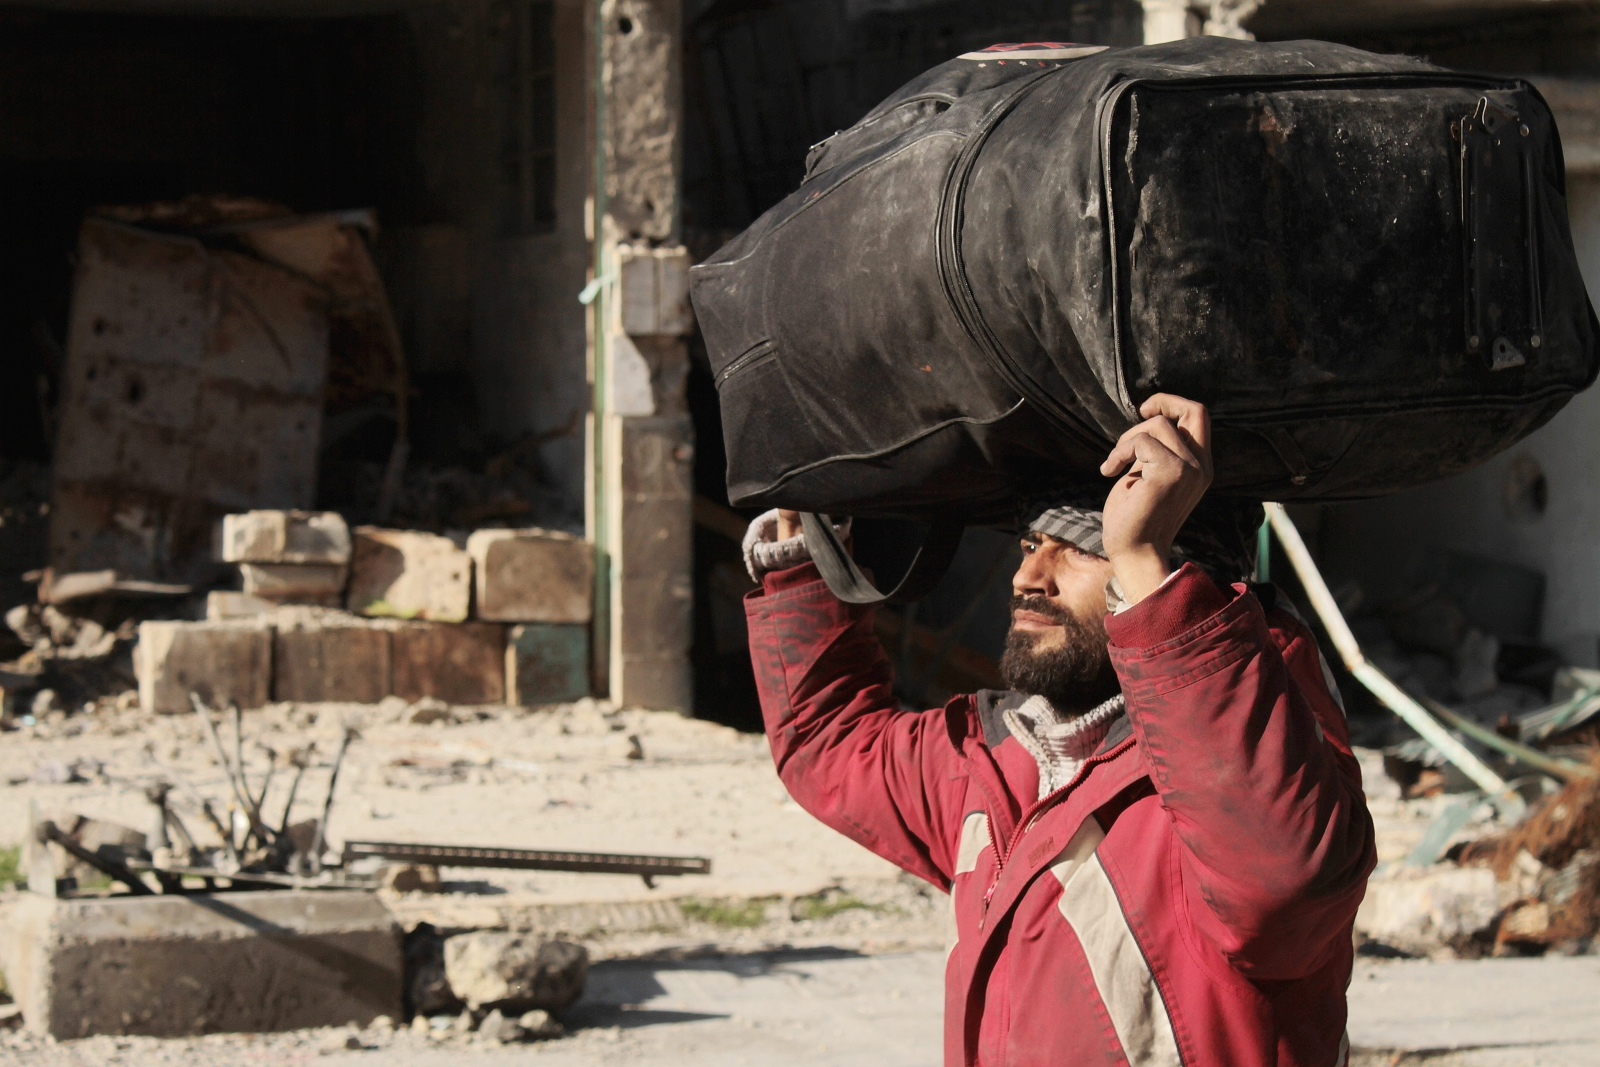 Trwa ewakuacja Aleppo. Fot. PAP/EPA/GHITH SY